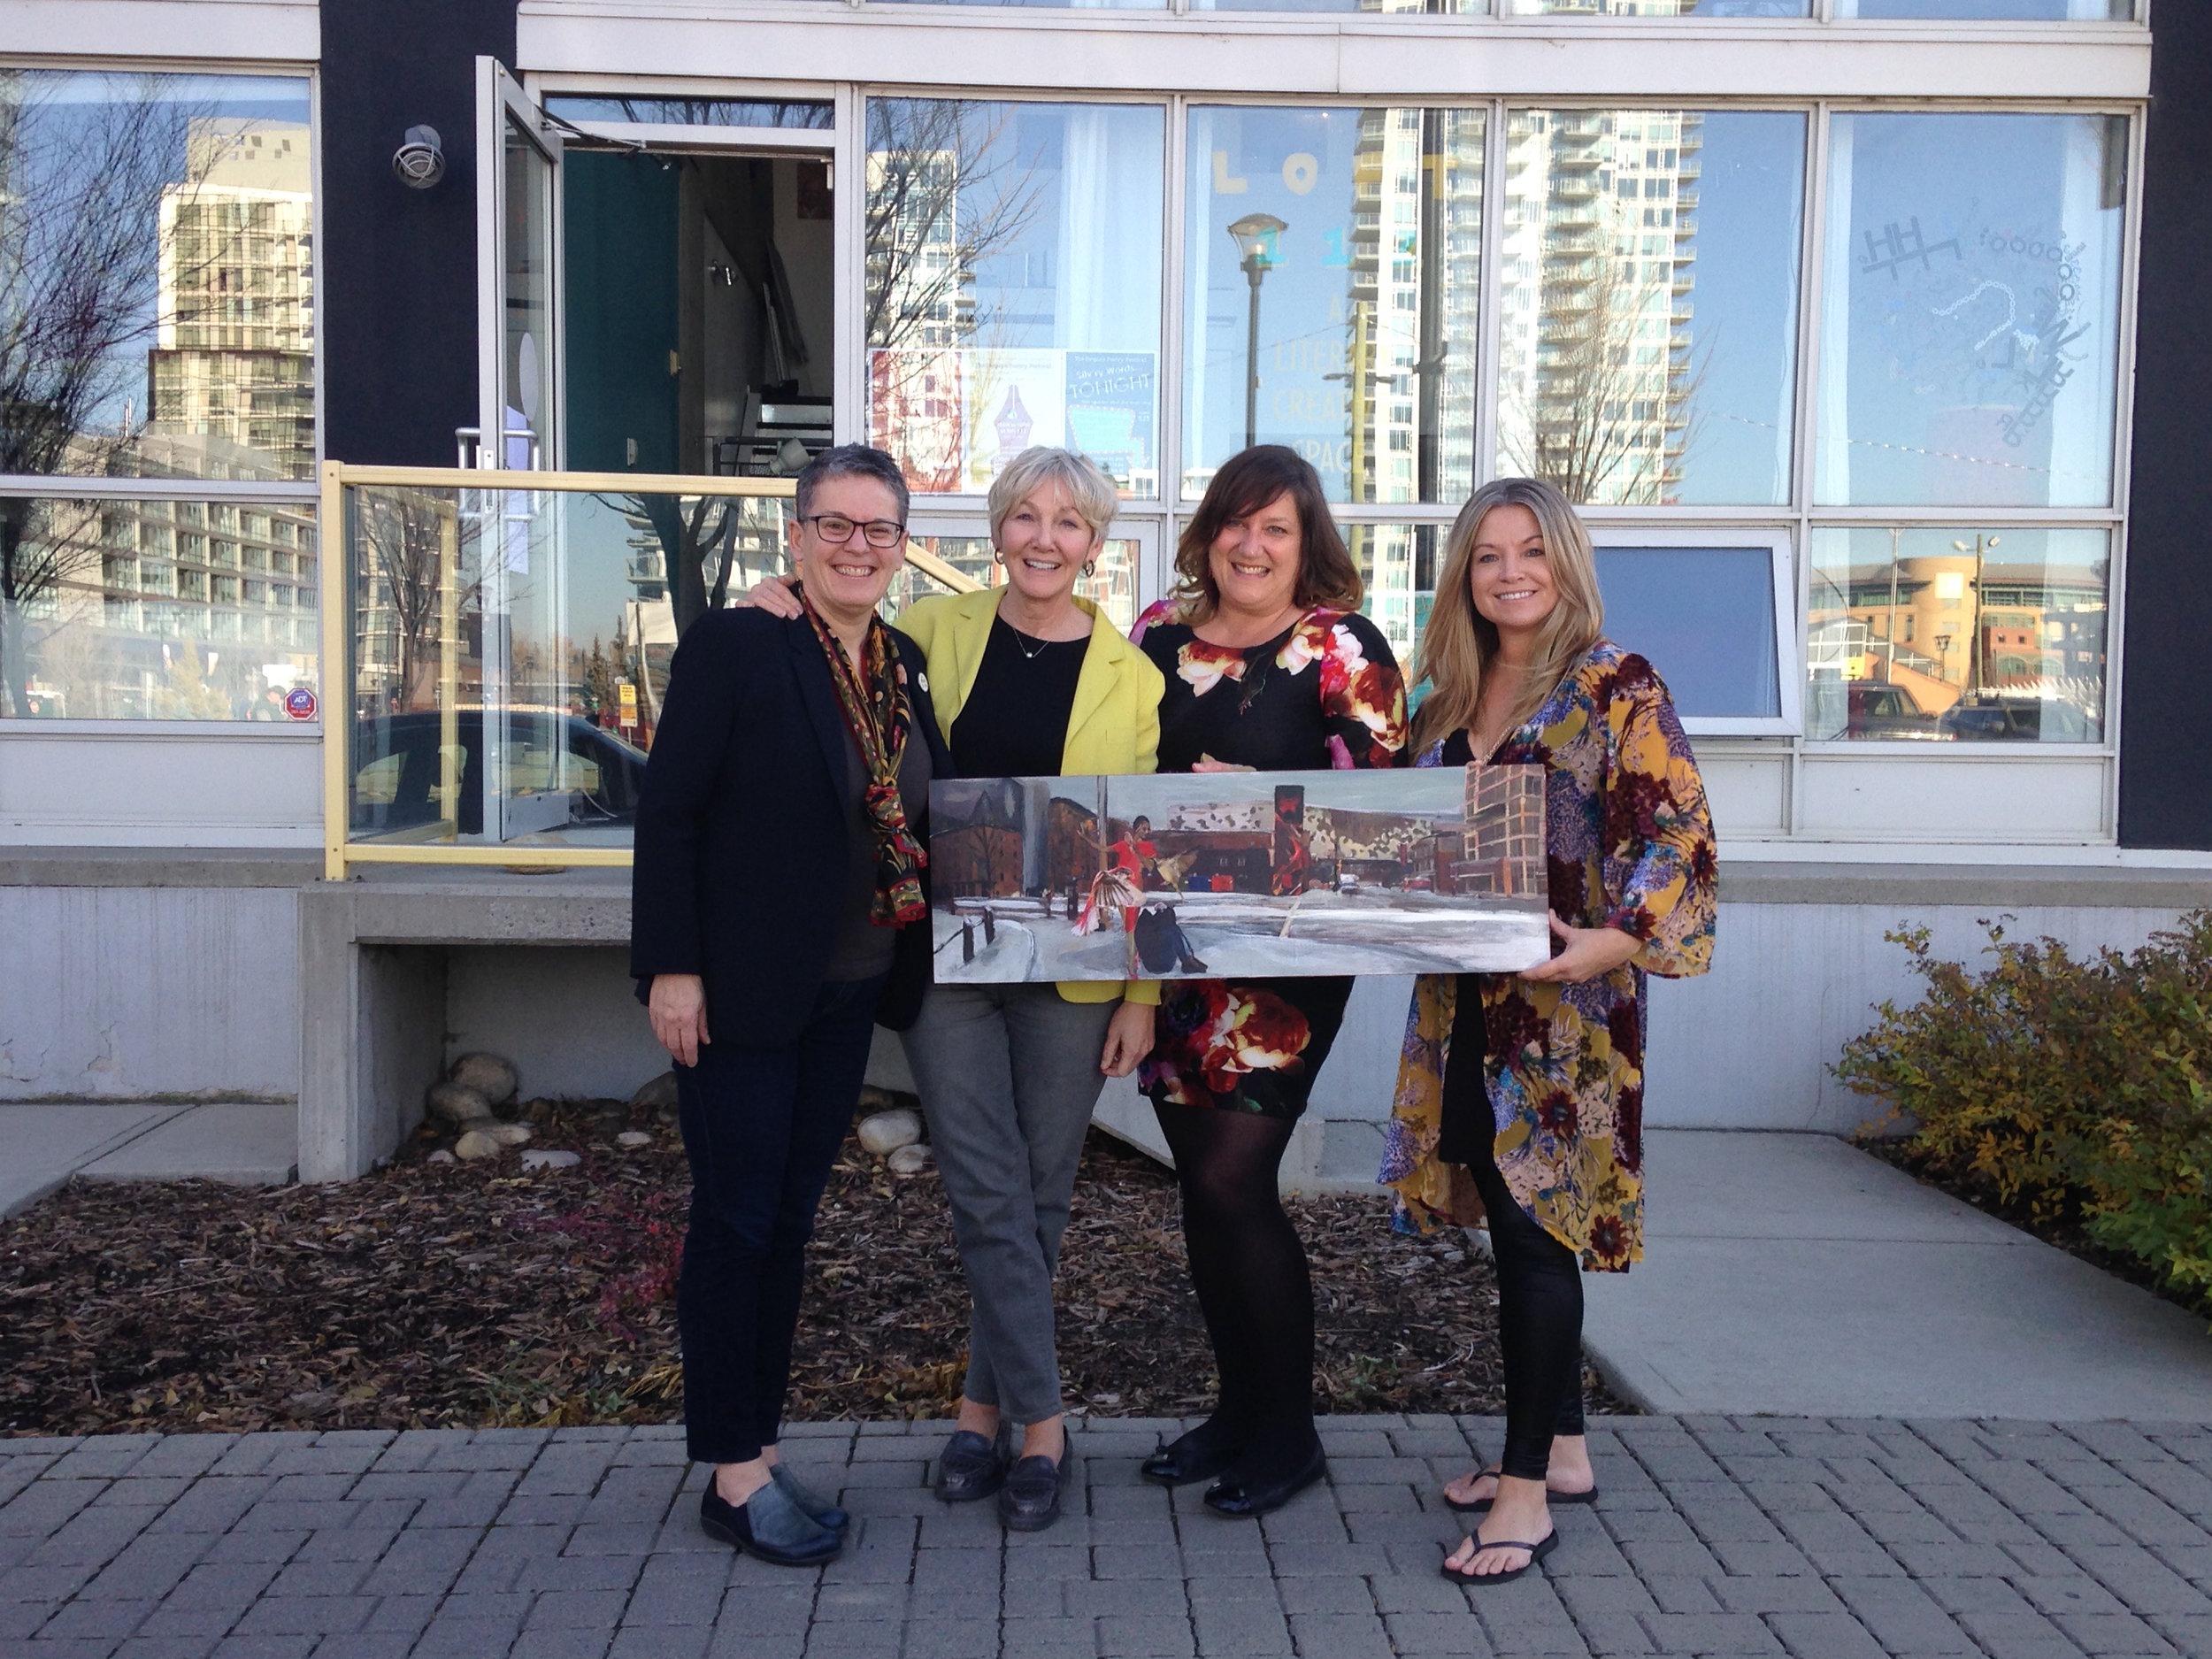 Calgary Bookmark champion Sean Hunter, poet Rosemary Griebel, Loft 112 director Lisa Murphy-Lamb, and artist Stacey Walyuchow, at Loft 112, Calgary, 2019.